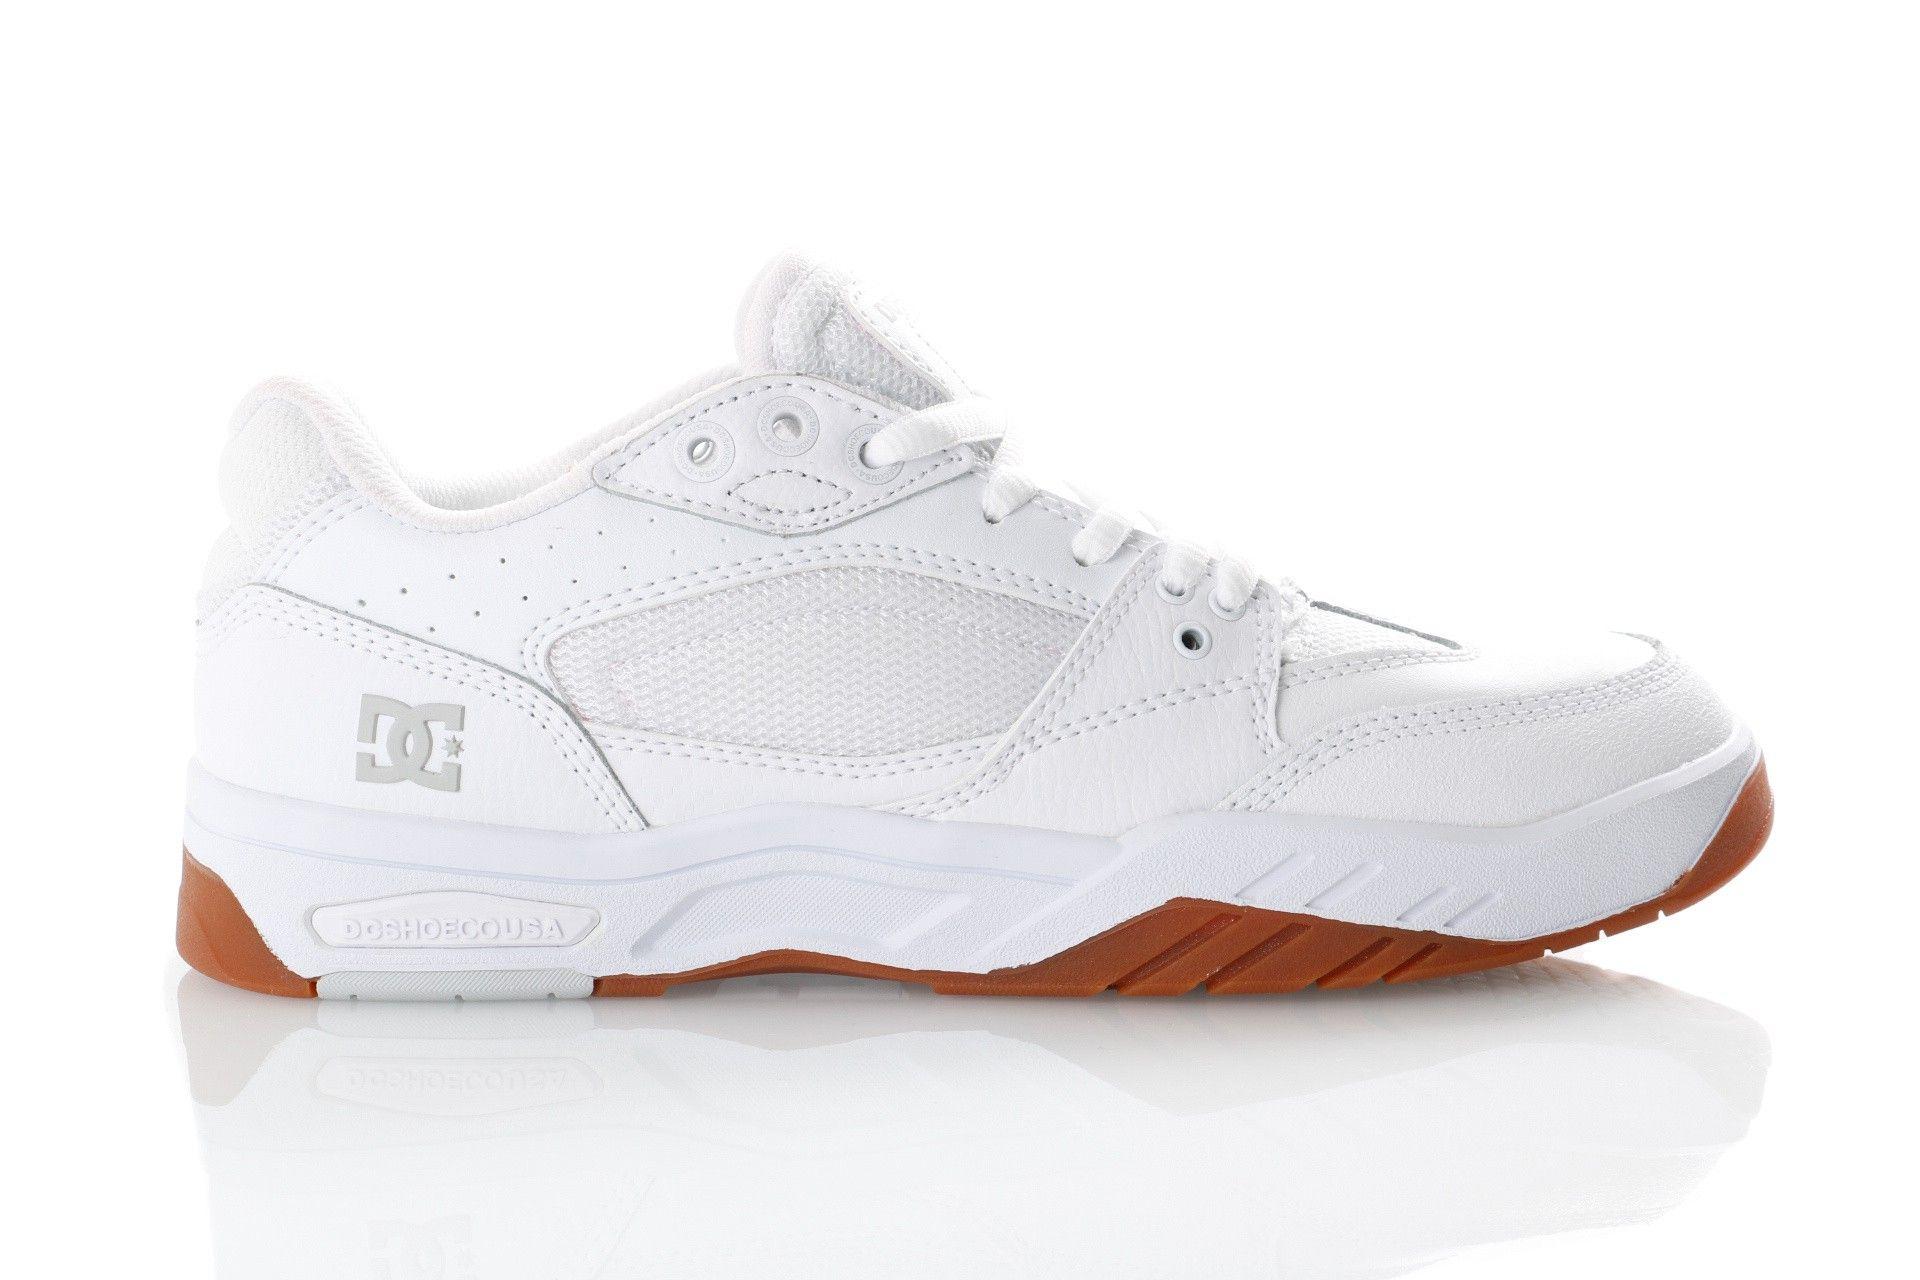 Afbeelding van Dc Maswell M Shoe Wg5 Adys100473-Wg5 Sneakers White/Gum